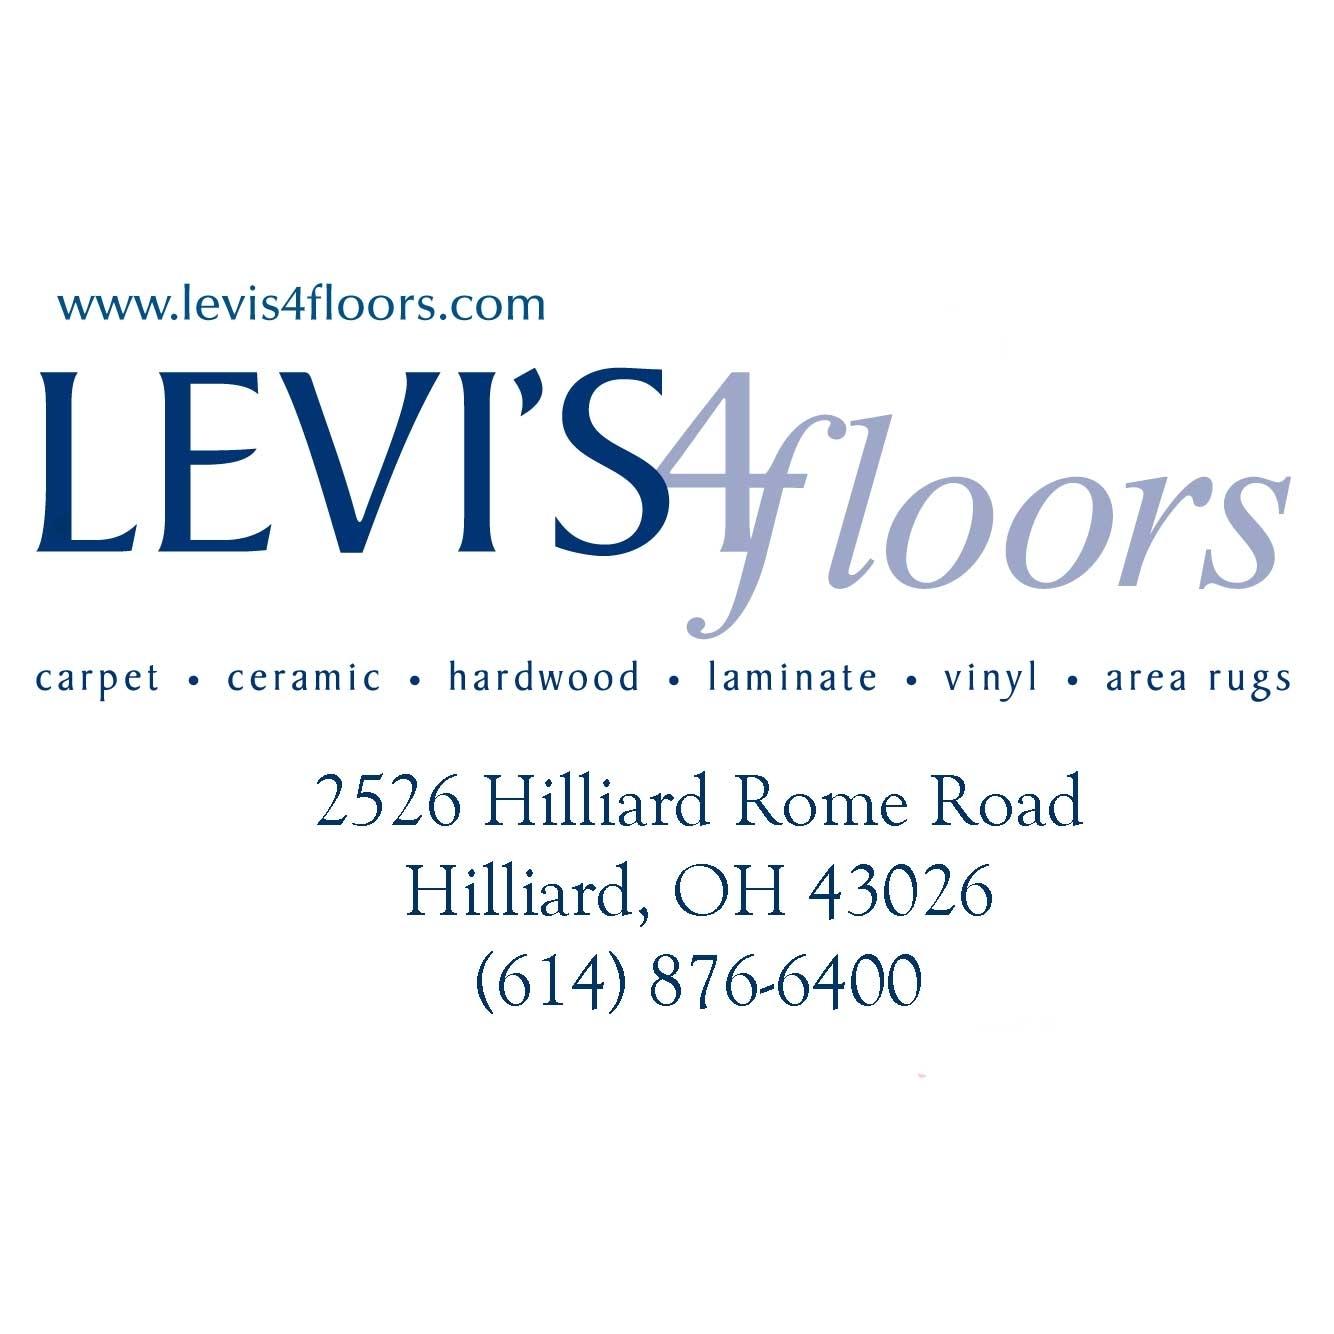 Levi's 4 Floors - Hilliard, OH - Carpet & Floor Coverings